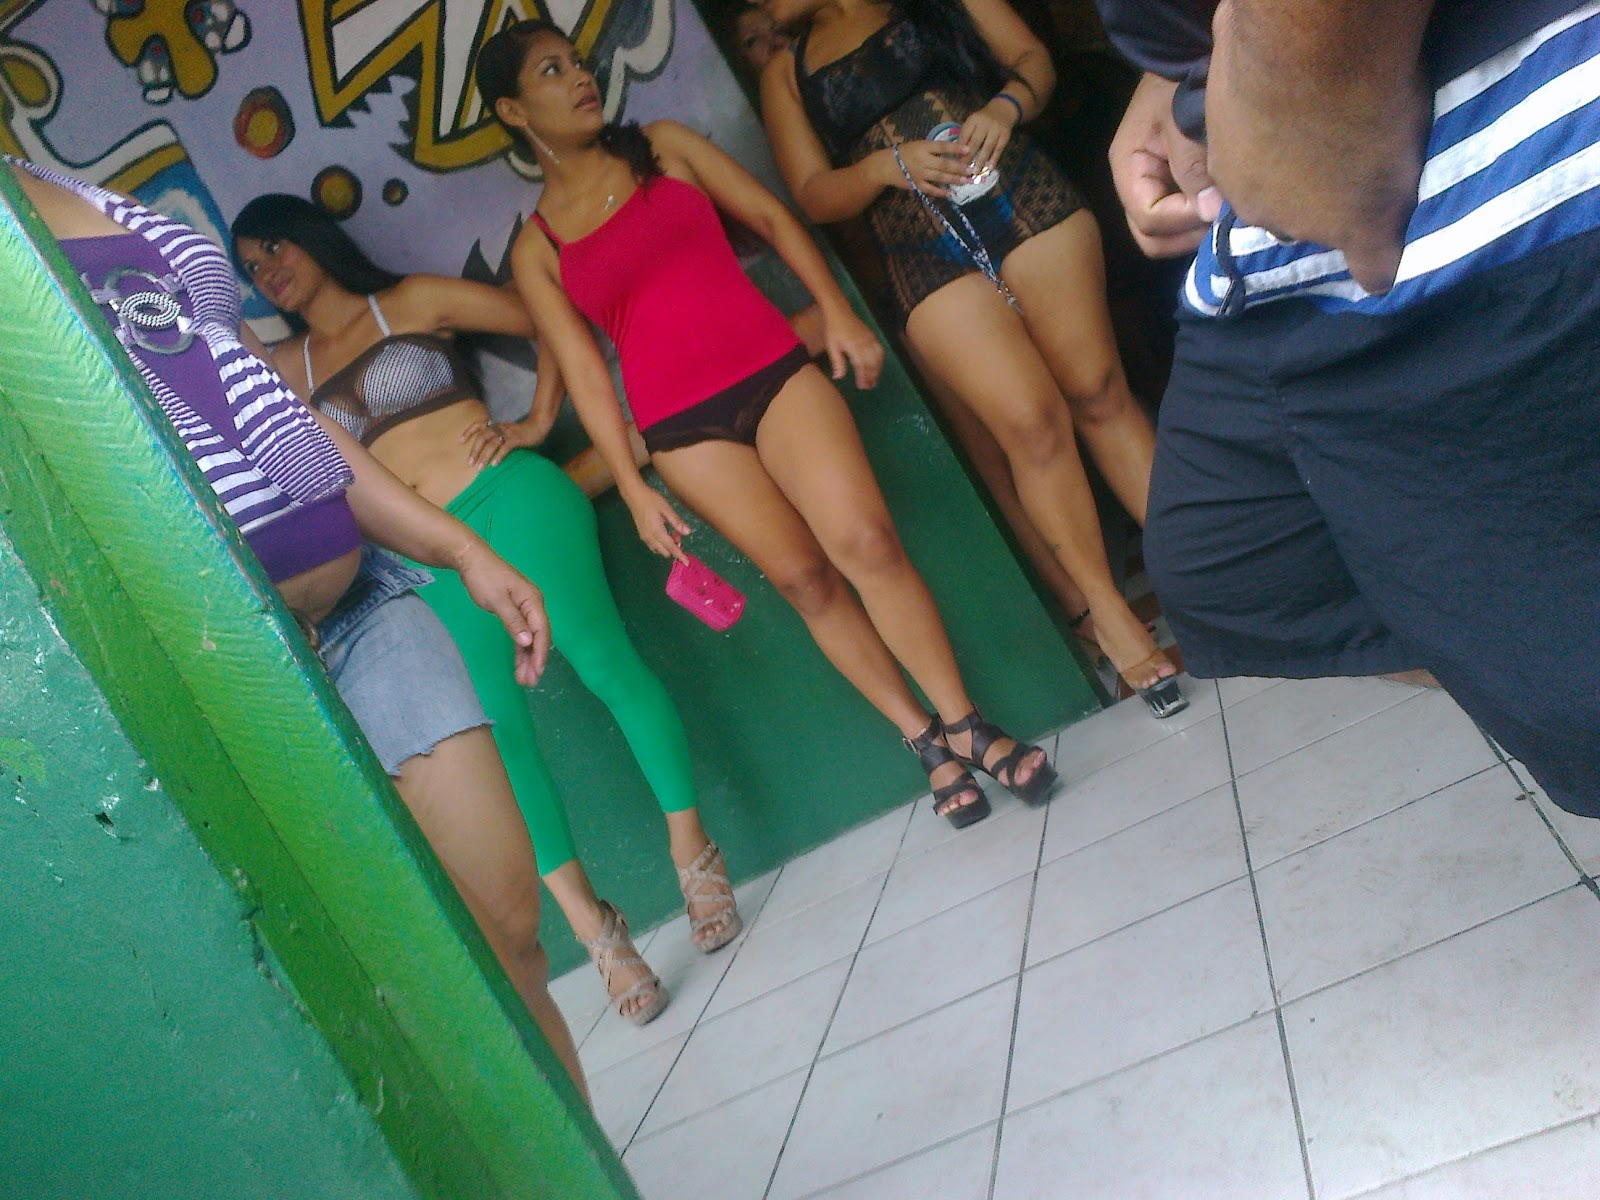 xxx prostitutas callejeras escorts famosas